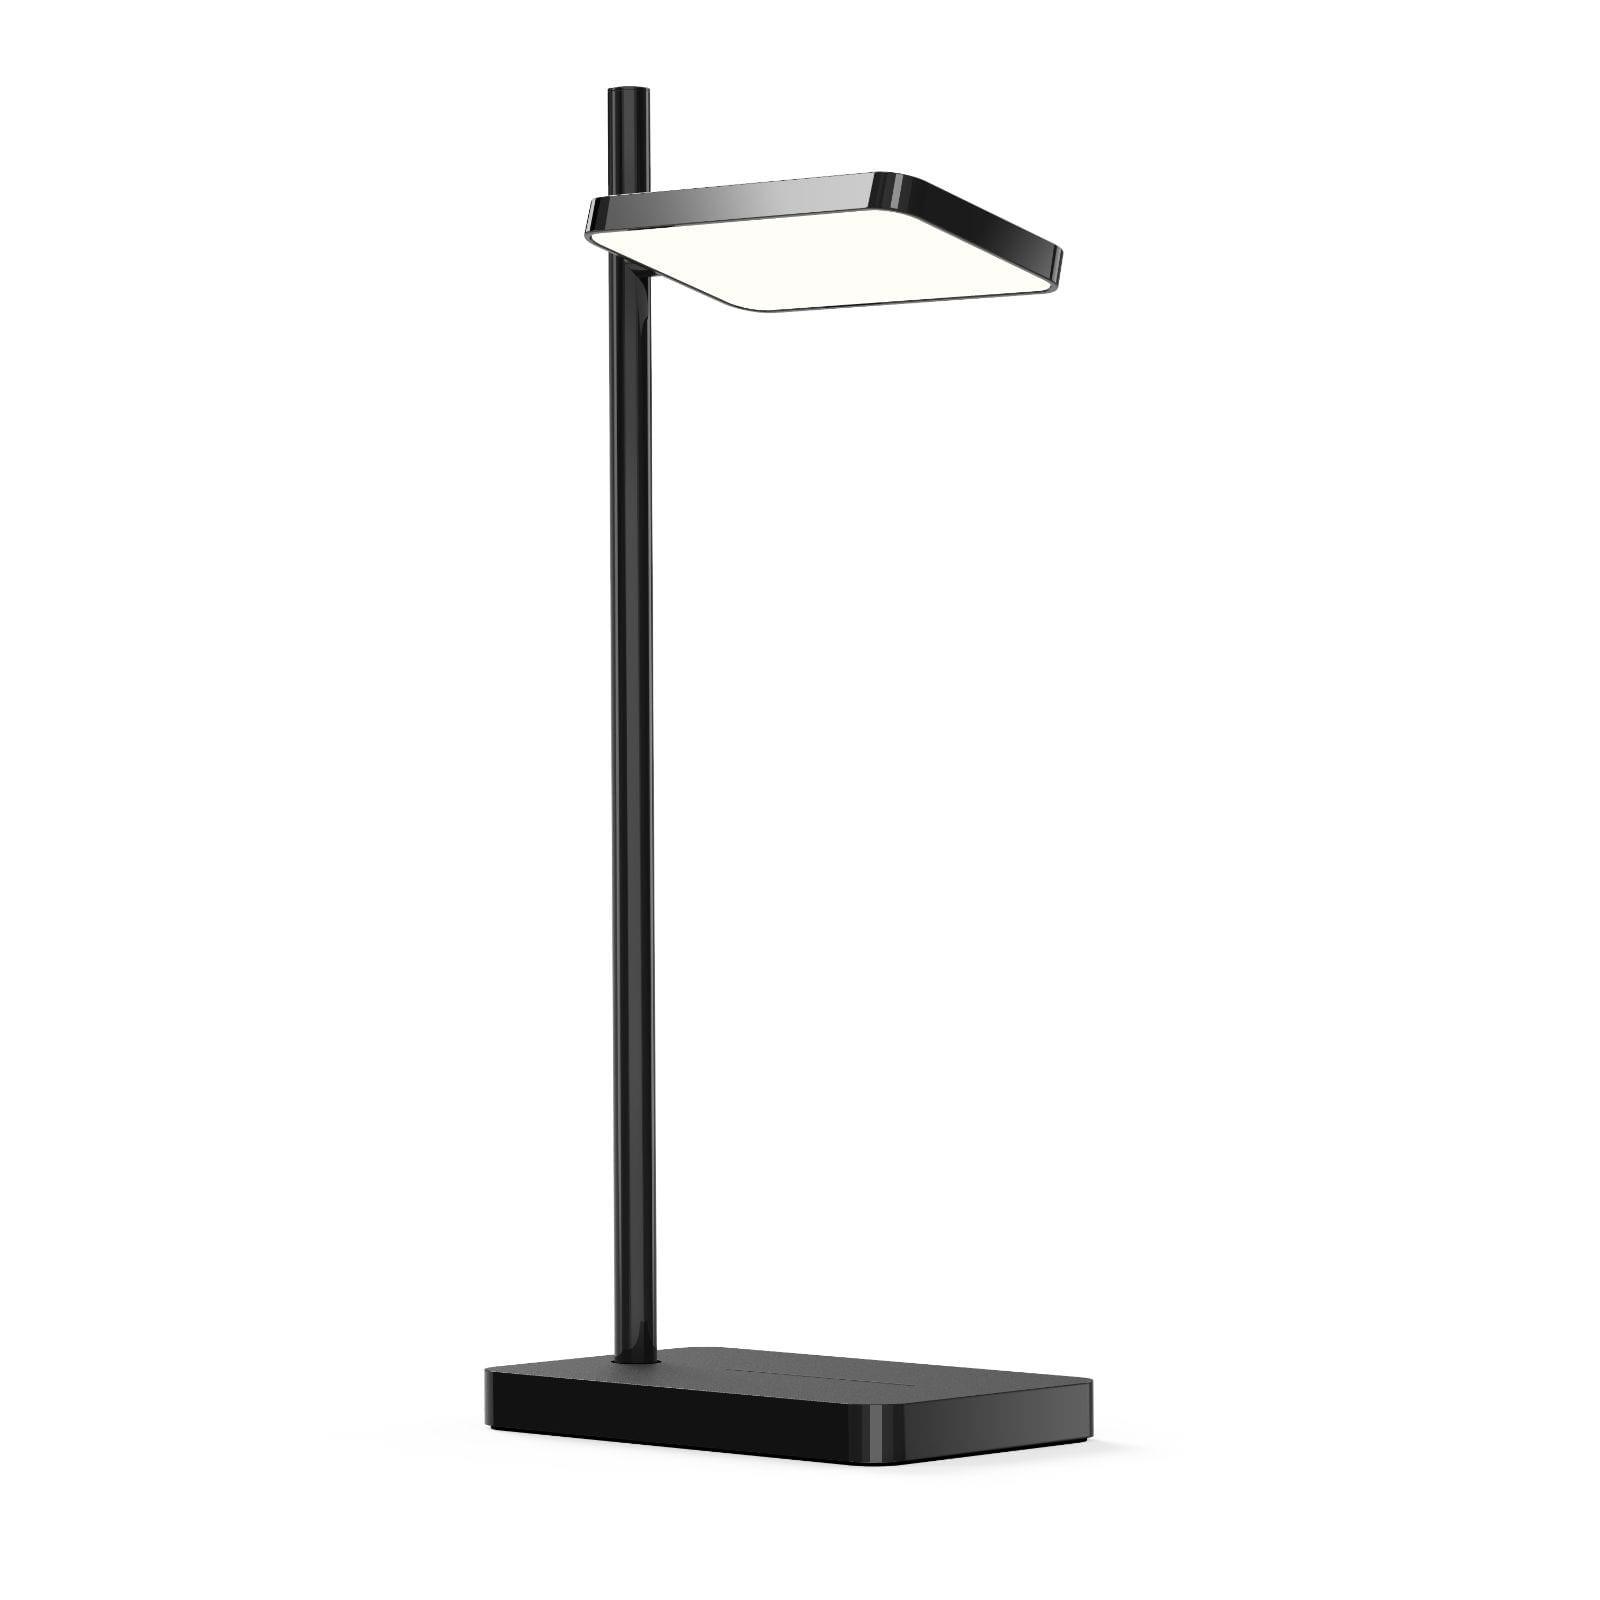 TALIA LED Desk Lamp (Black) - Pablo Designs